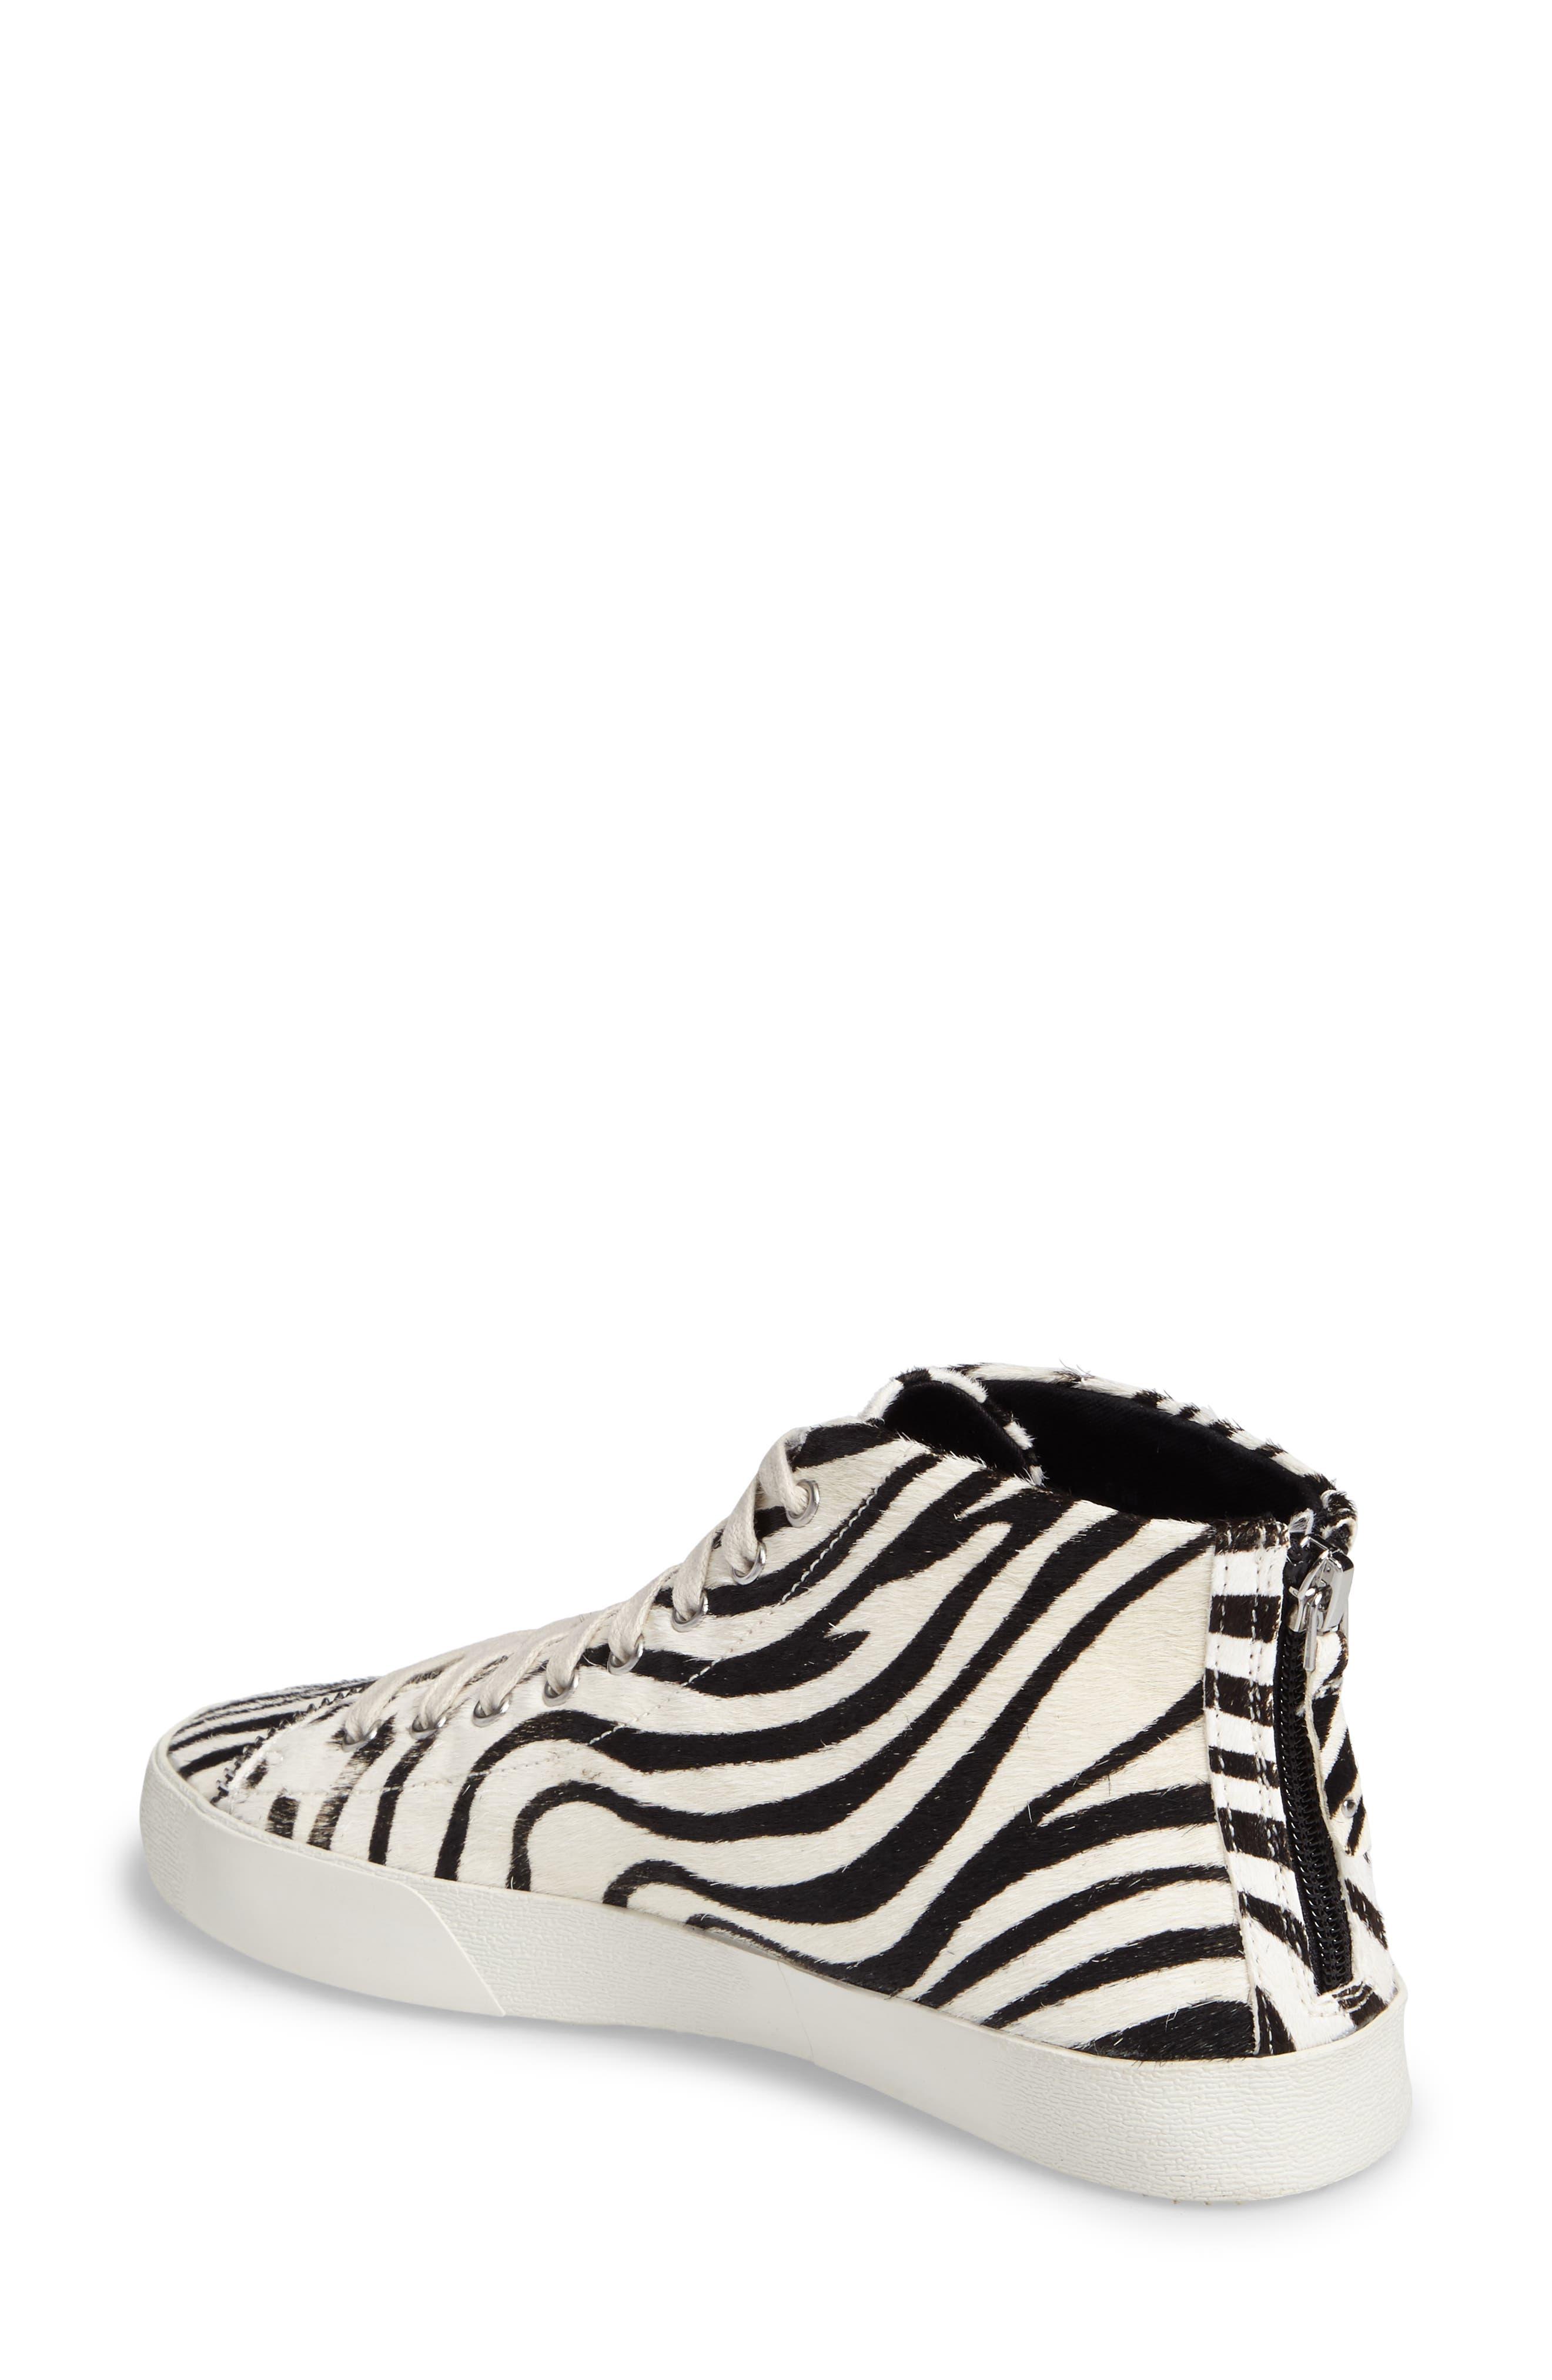 Alternate Image 2  - Rebecca Minkoff Zaina Too Genuine Calf Hair Sneaker (Women)